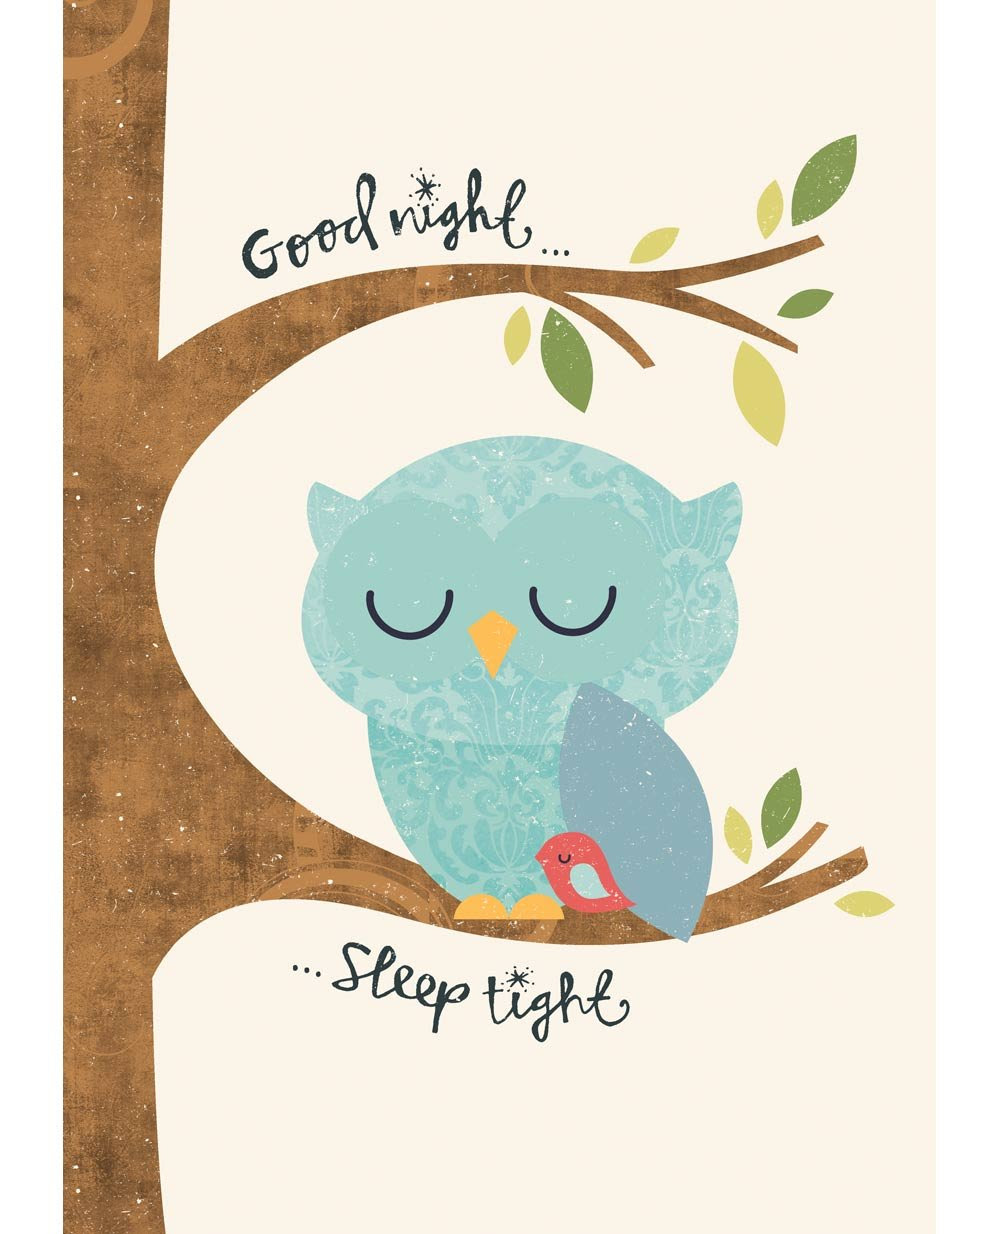 Charlotte Smarty Pants Night Night Sleep Tight